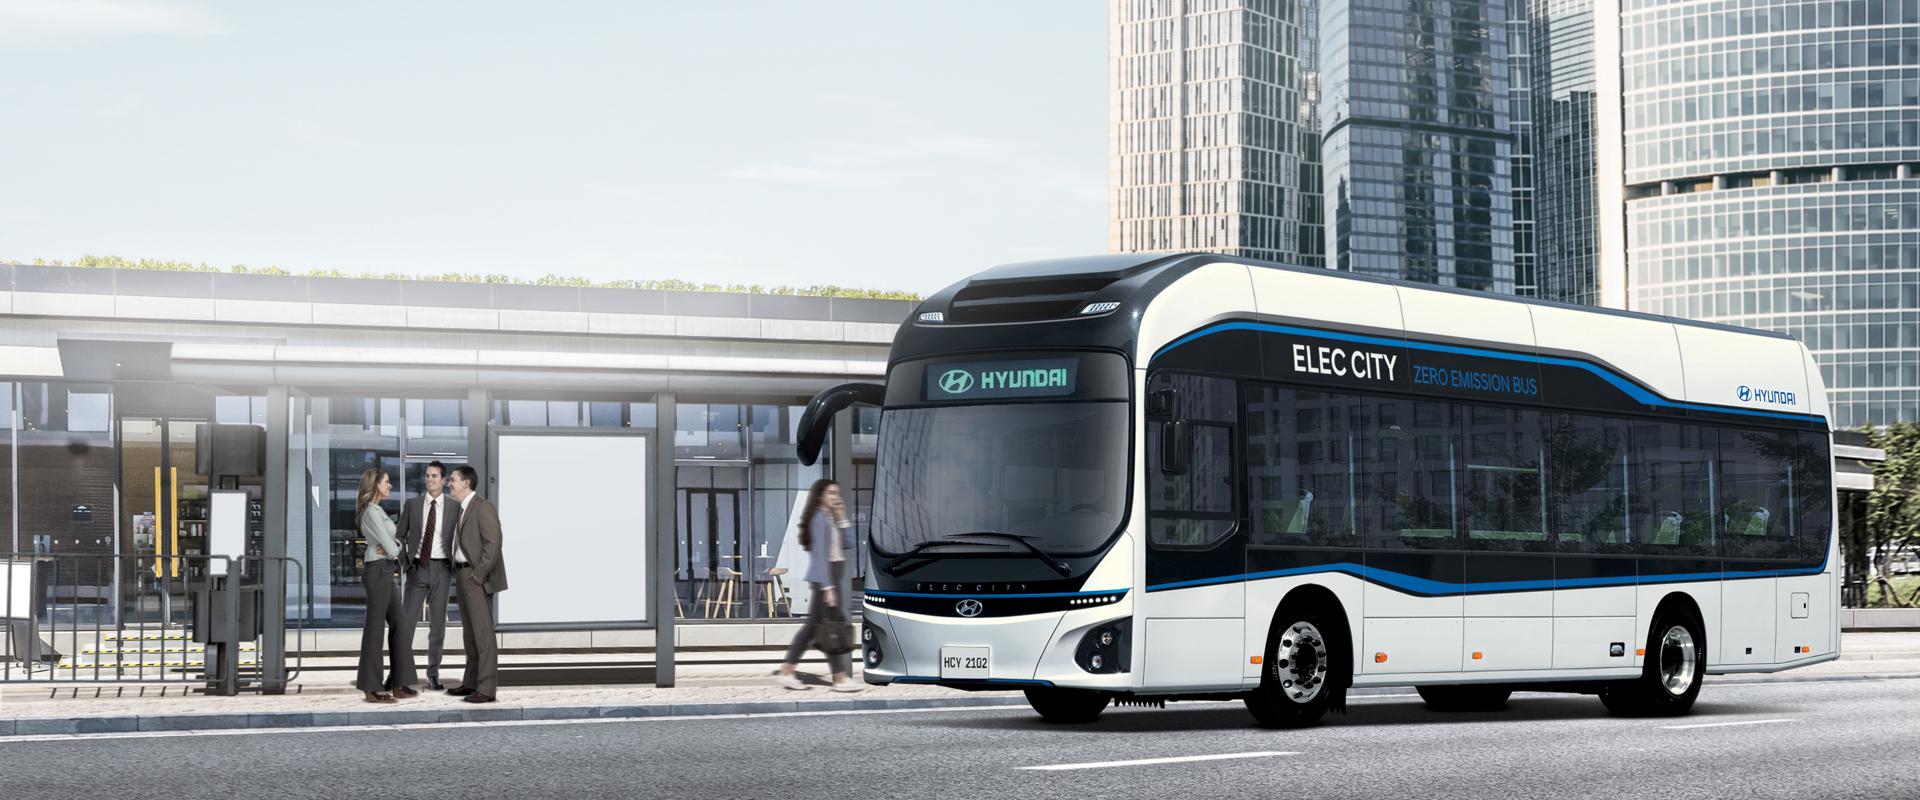 Hydrogen Electric Bus Shuttle Bus Service